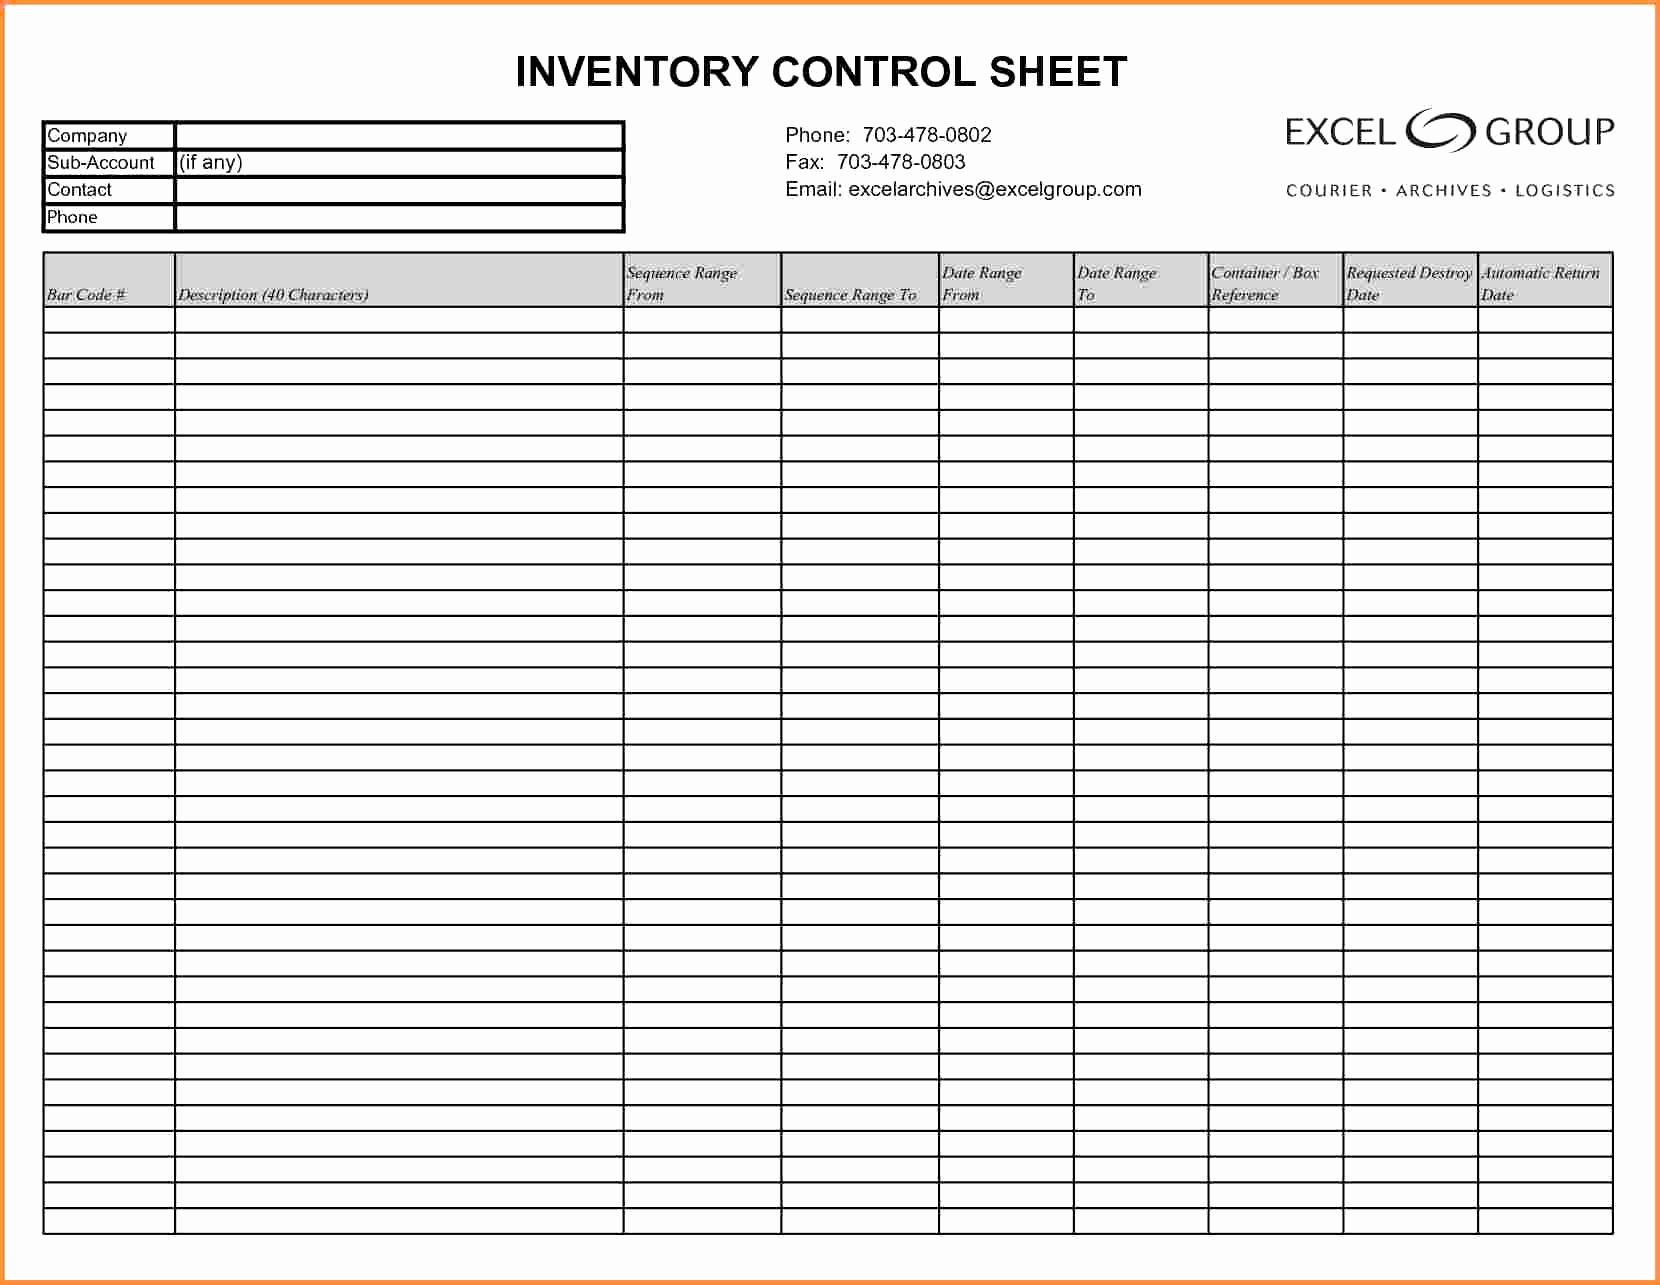 Vending Machine Inventory Excel Spreadsheet Inspirational Vending And Vending Machine Inventory Spreadsheet